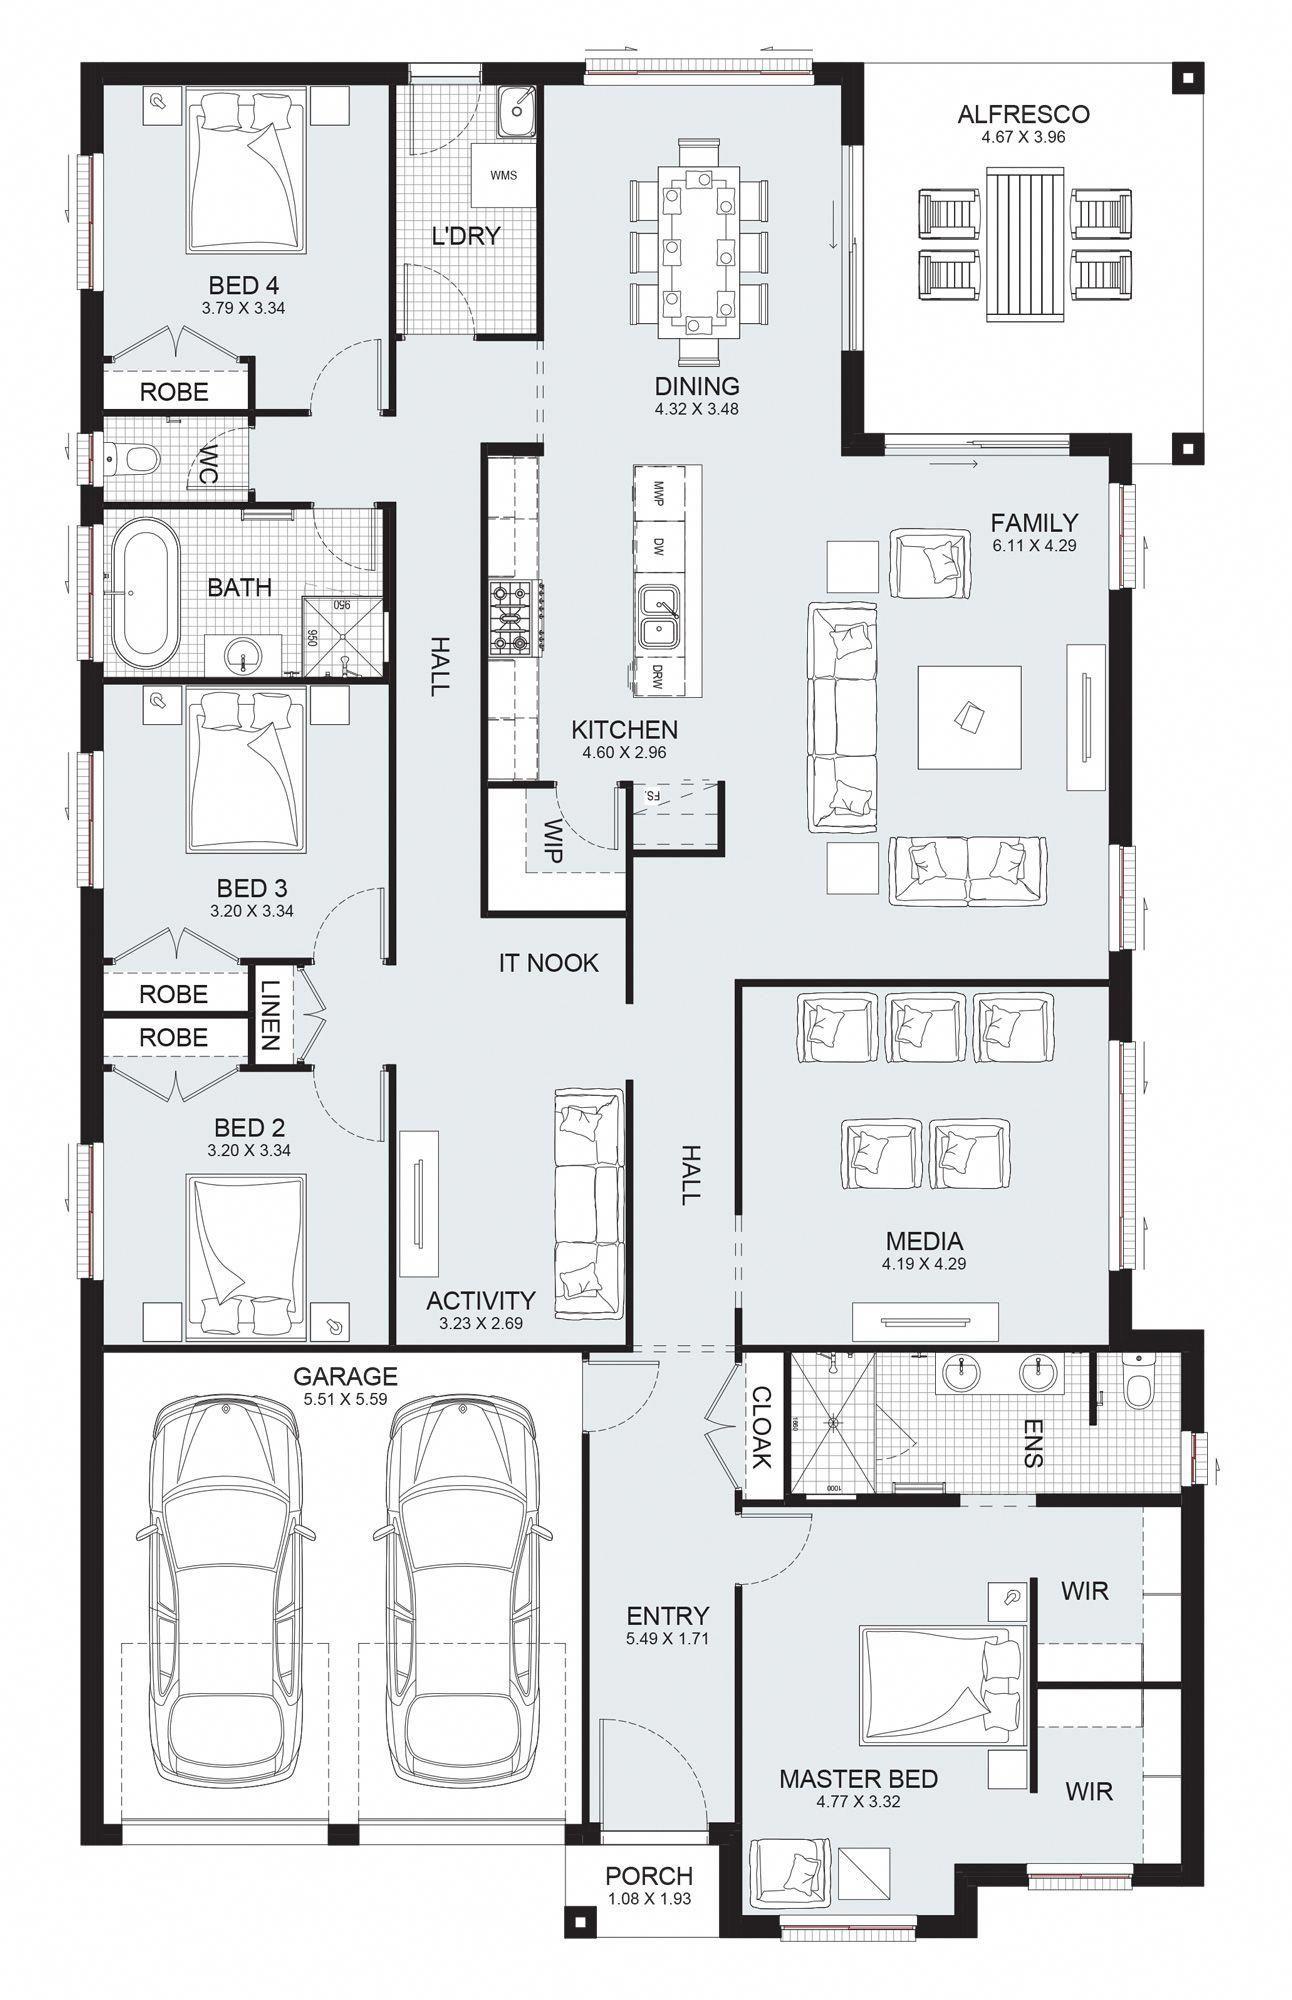 Sierra 29 Single Level Floorplan By Kurmond Homes New Home Builders Sydney Nsw Modernhom Home Design Floor Plans Single Level House Plans My House Plans